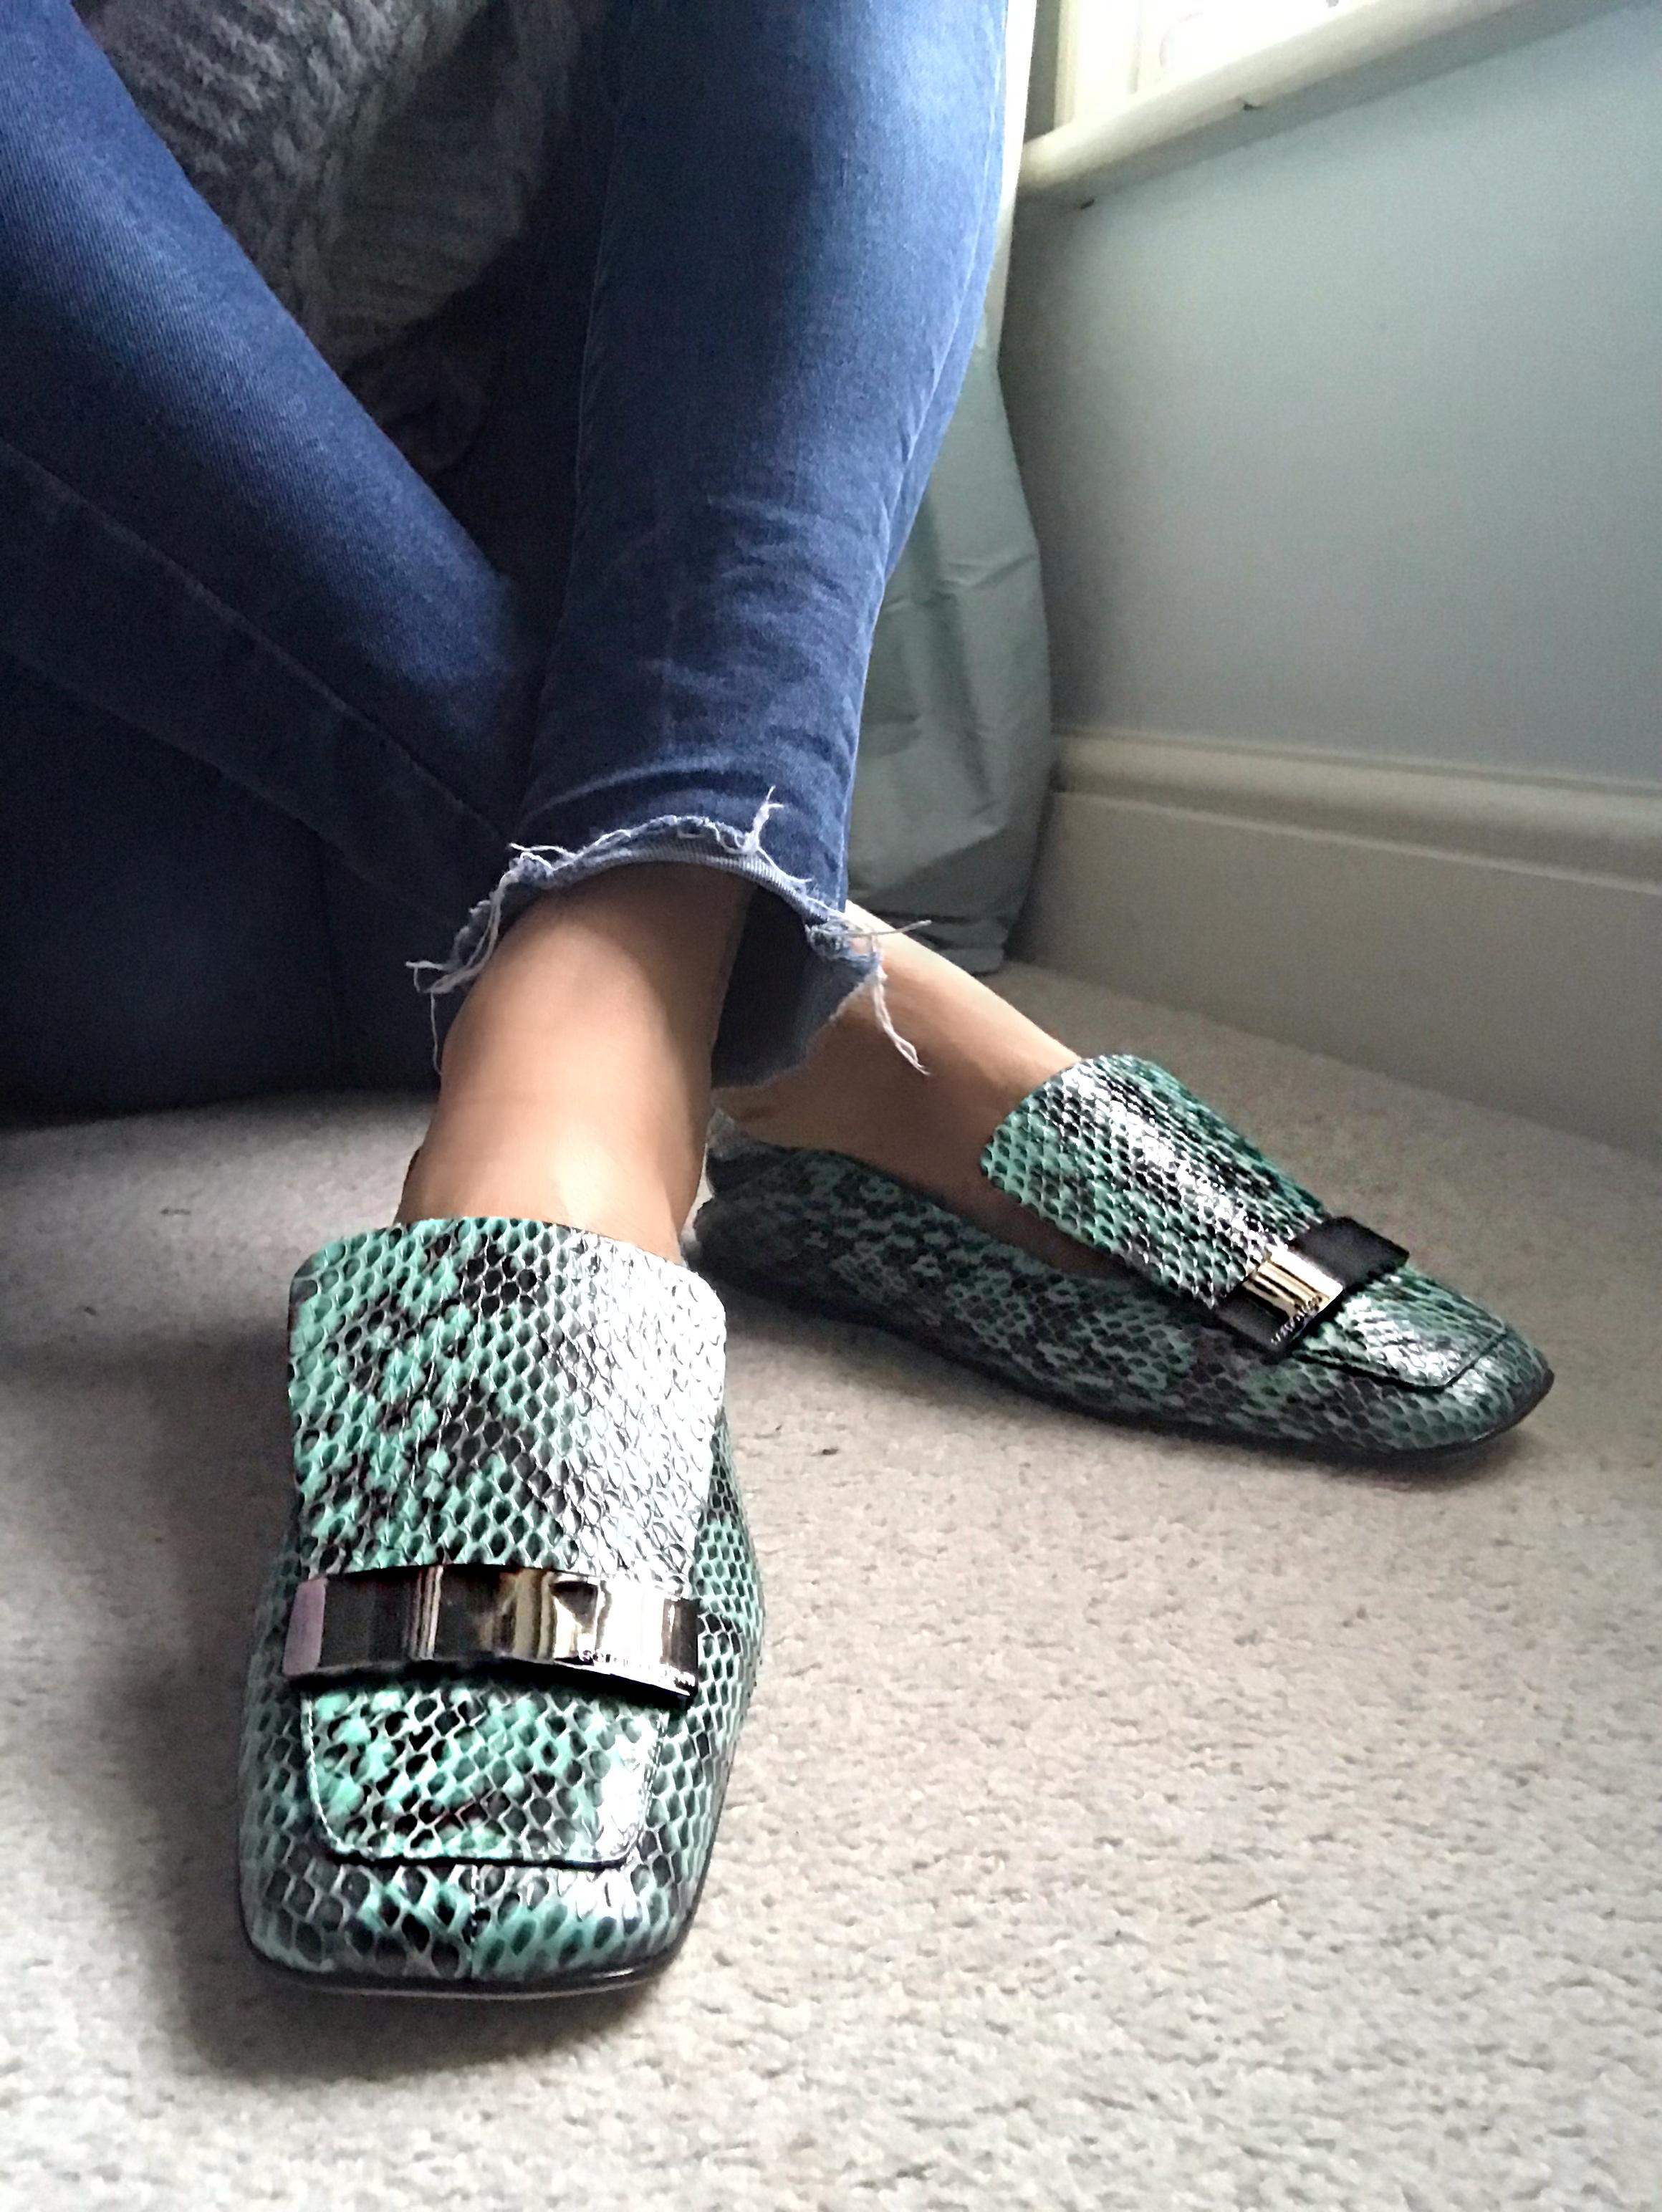 sergio my shoes.jpg